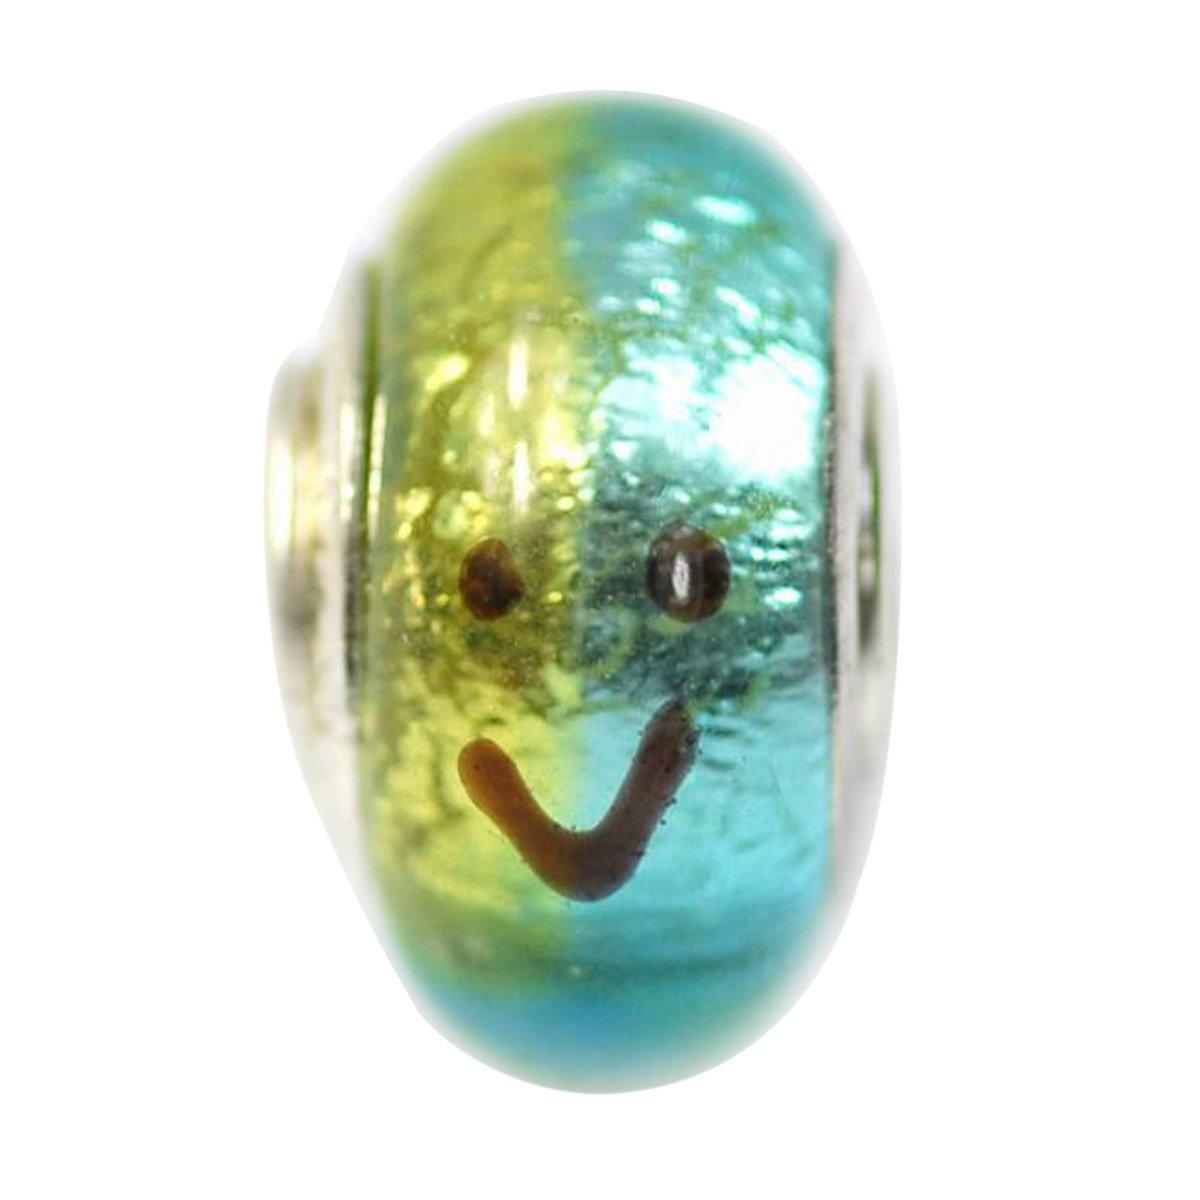 De Buman Glass Blue and Yellow Smile Fashion Charm Bead